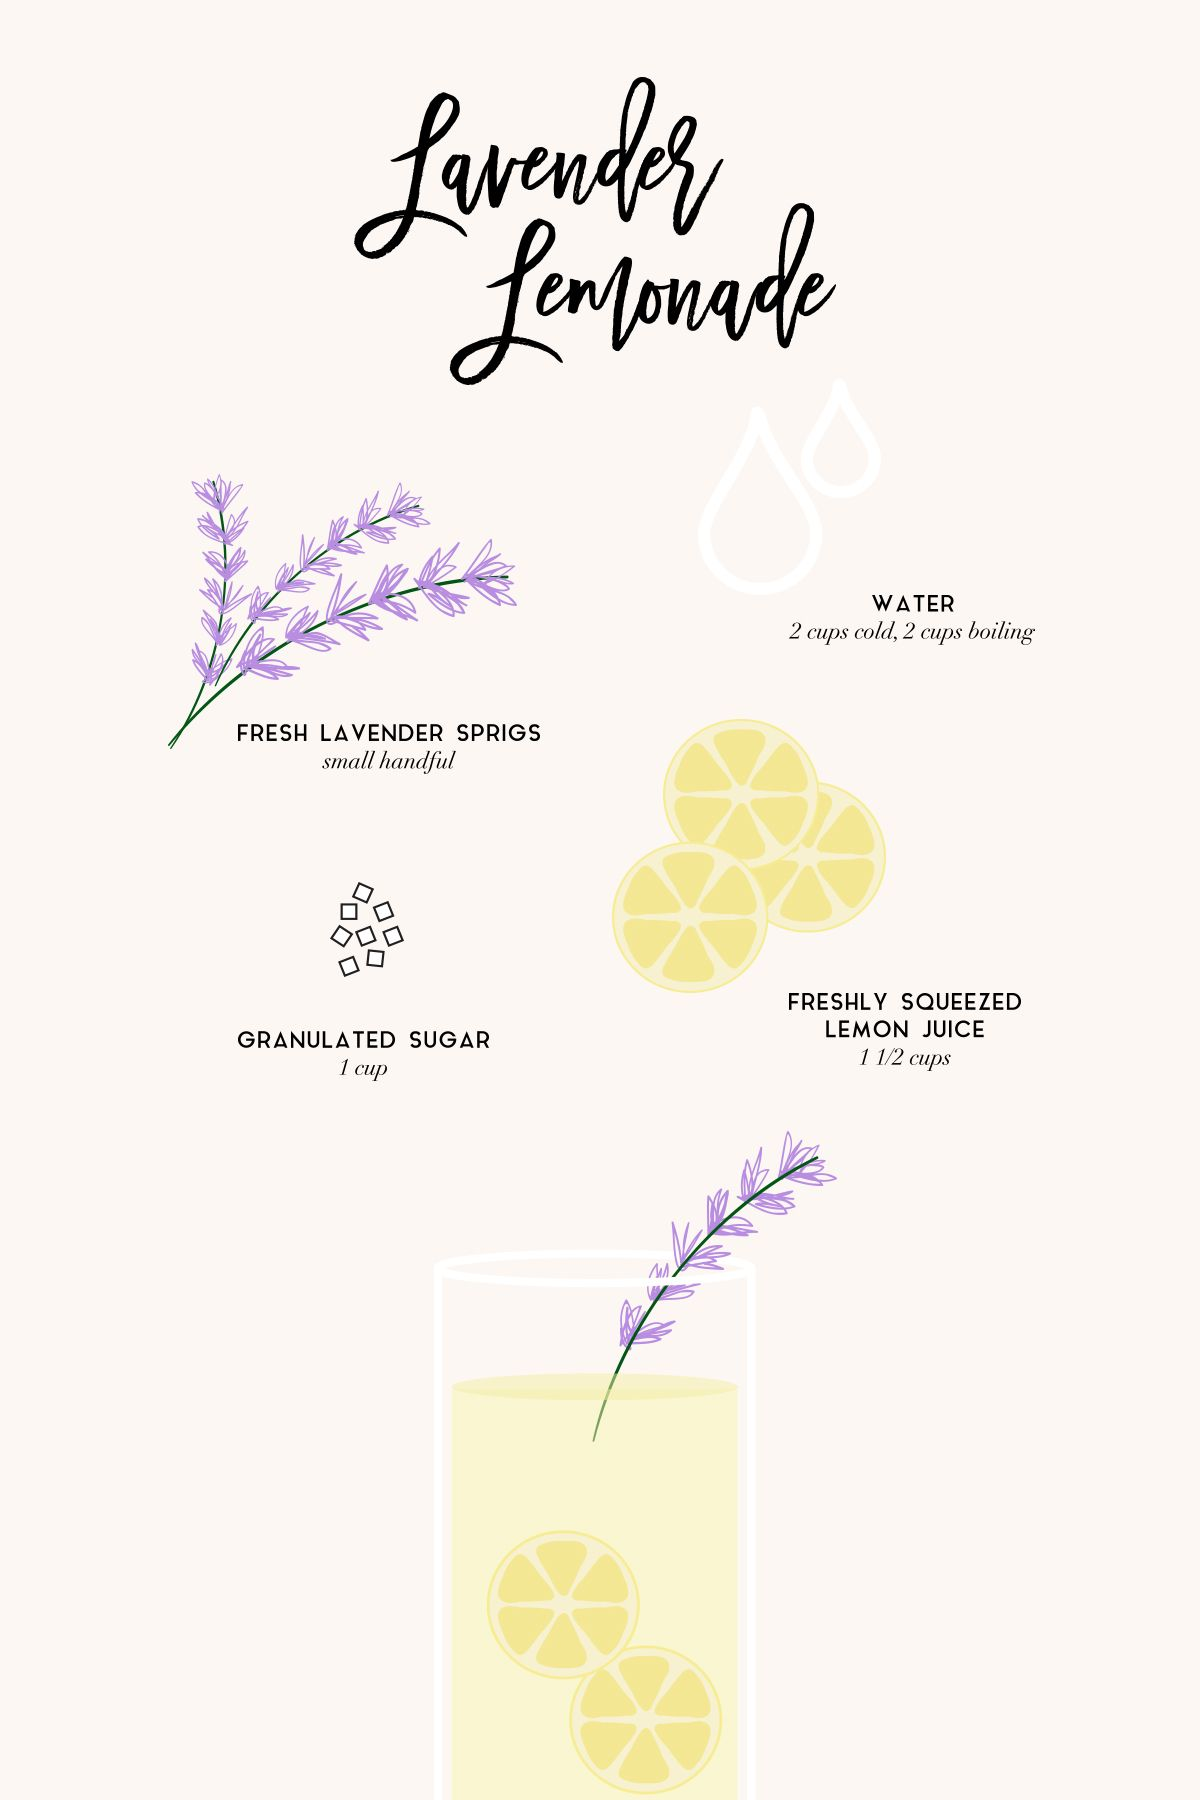 Lavender Lemonade Recipe Illustration With Love Amanda Lavender Lemonade Lemonade Recipes Food Illustrations